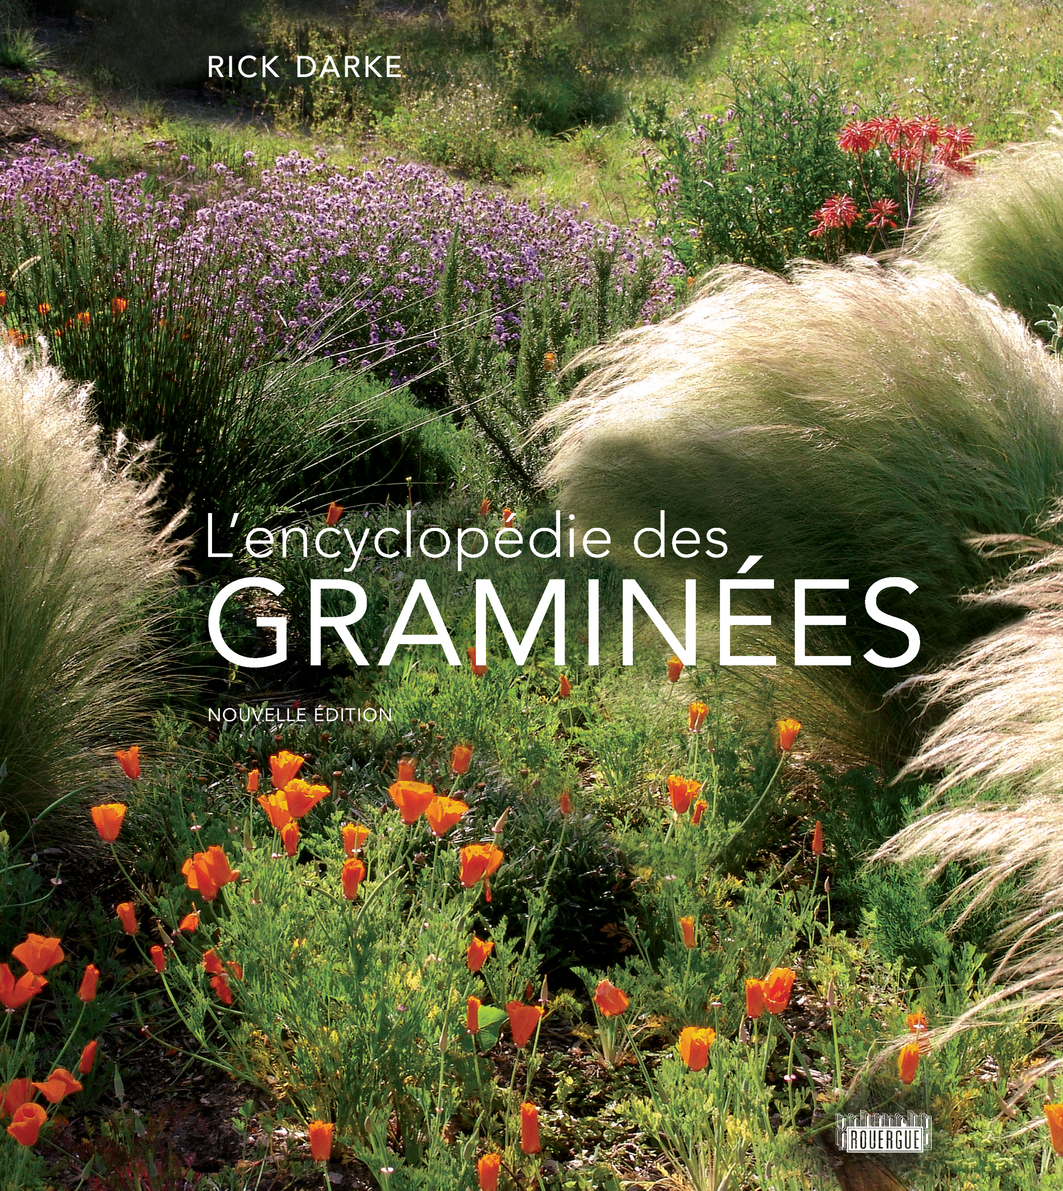 ENCYCLOPEDIE DES GRAMINEES  (NOUVELLE EDITION)